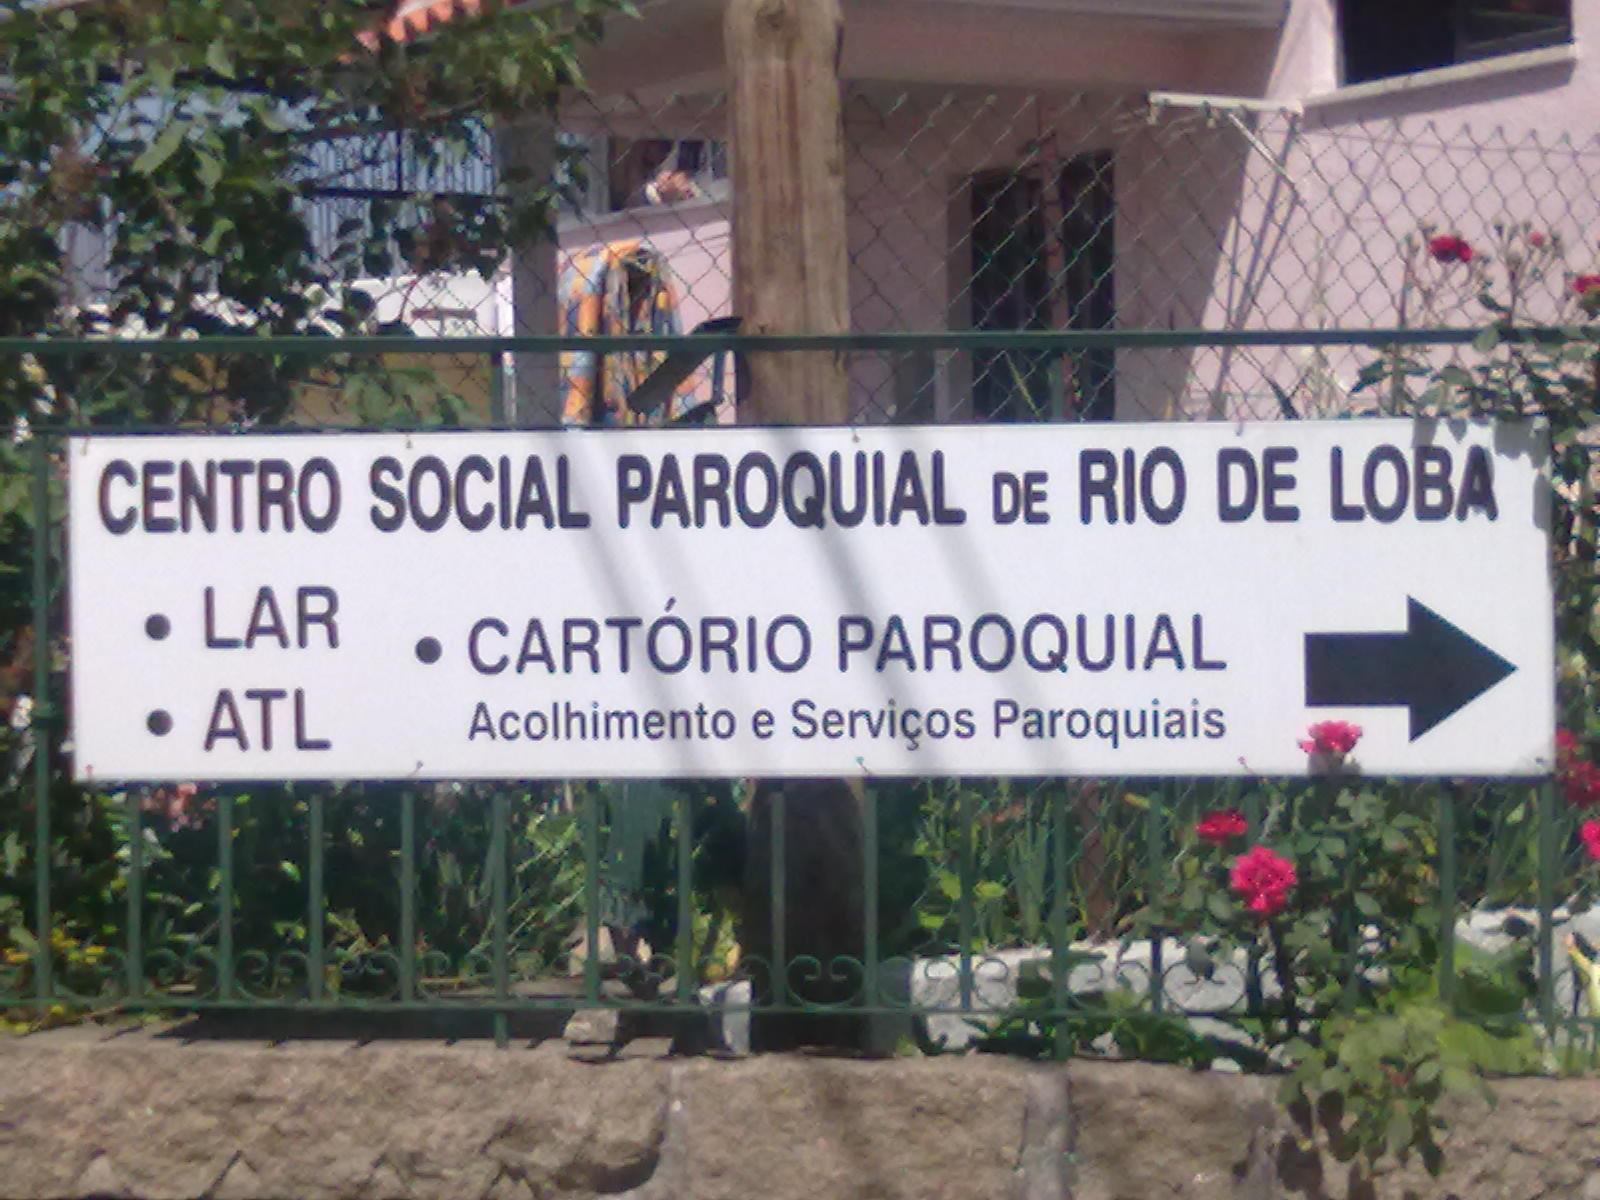 Centro Social Paroquial de Rio de Loba implementa atividades socioeducativas online